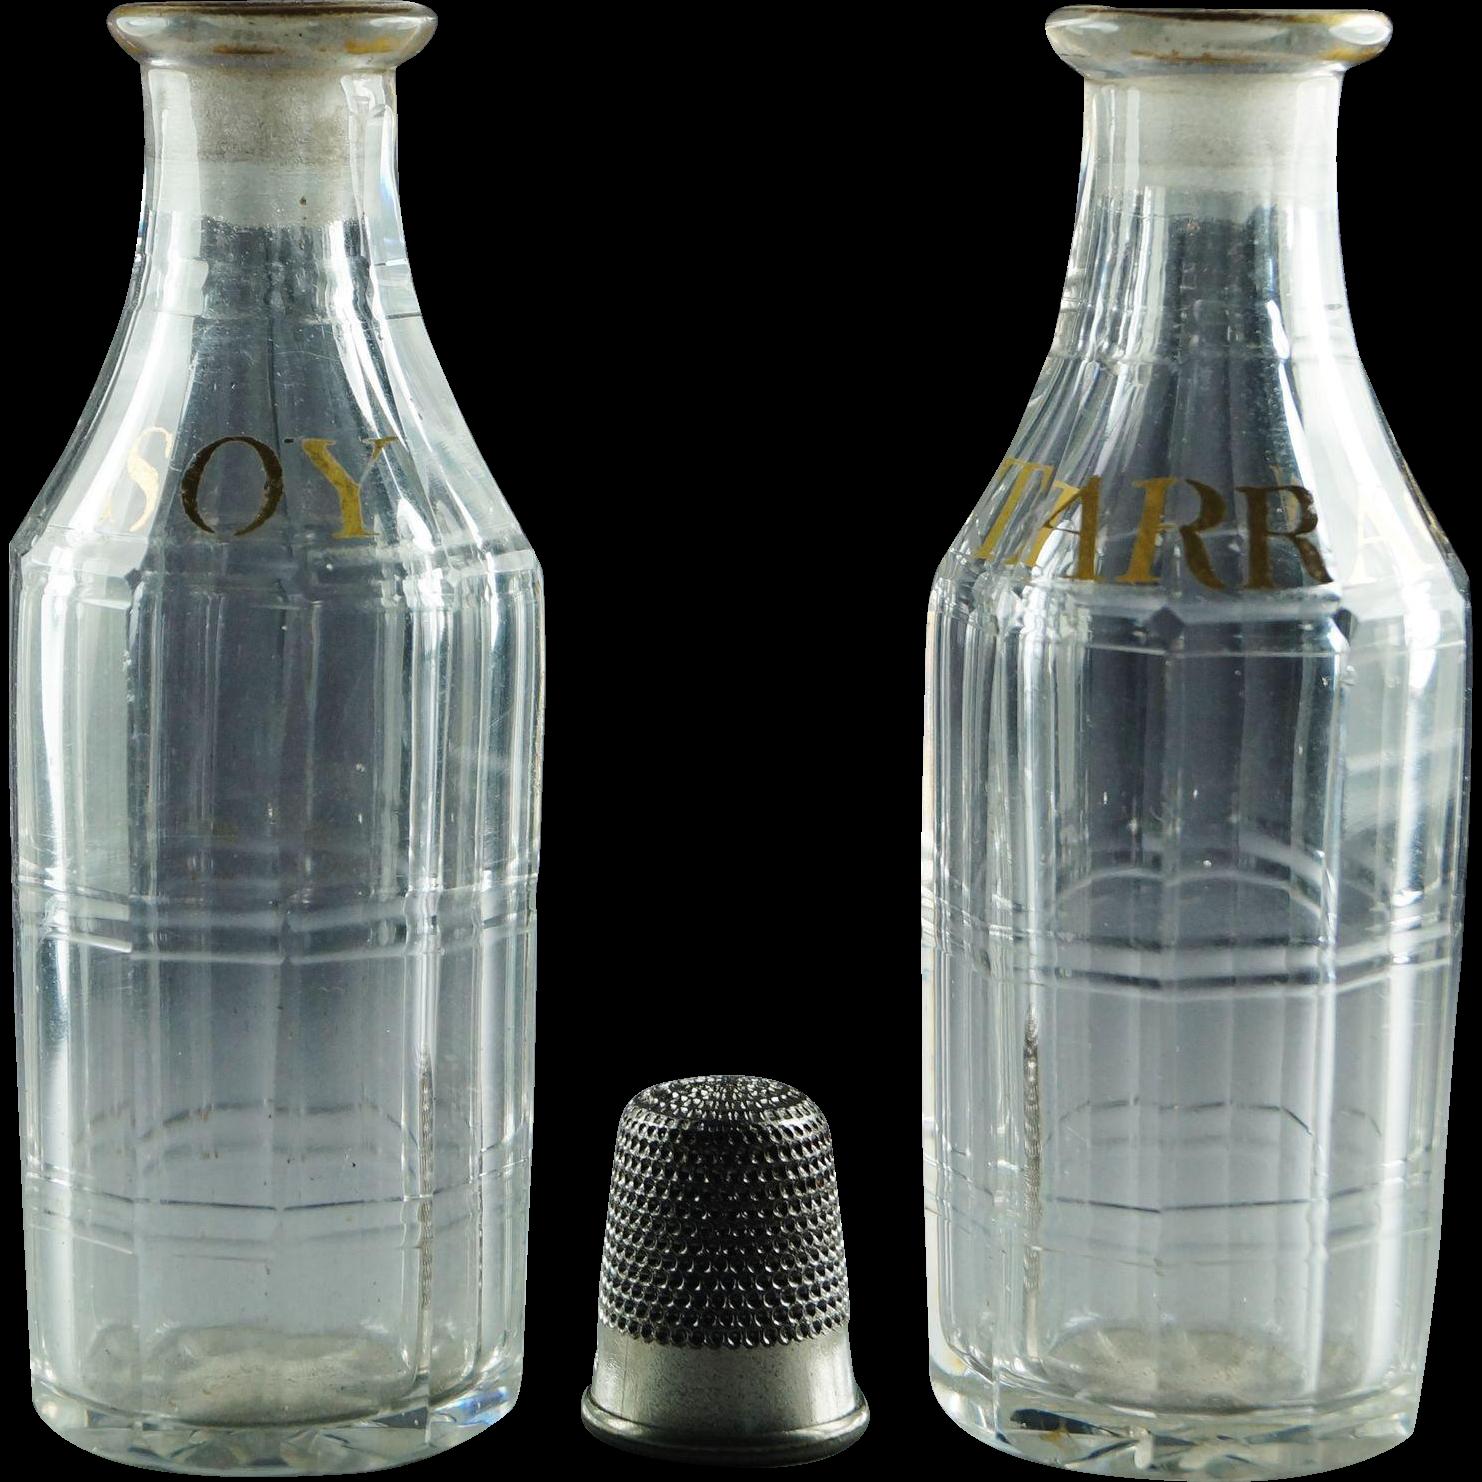 18th Century Miniature Glass Bottle Pair Condiment Sauce Soy and Tarragon Circa 1780 Rare